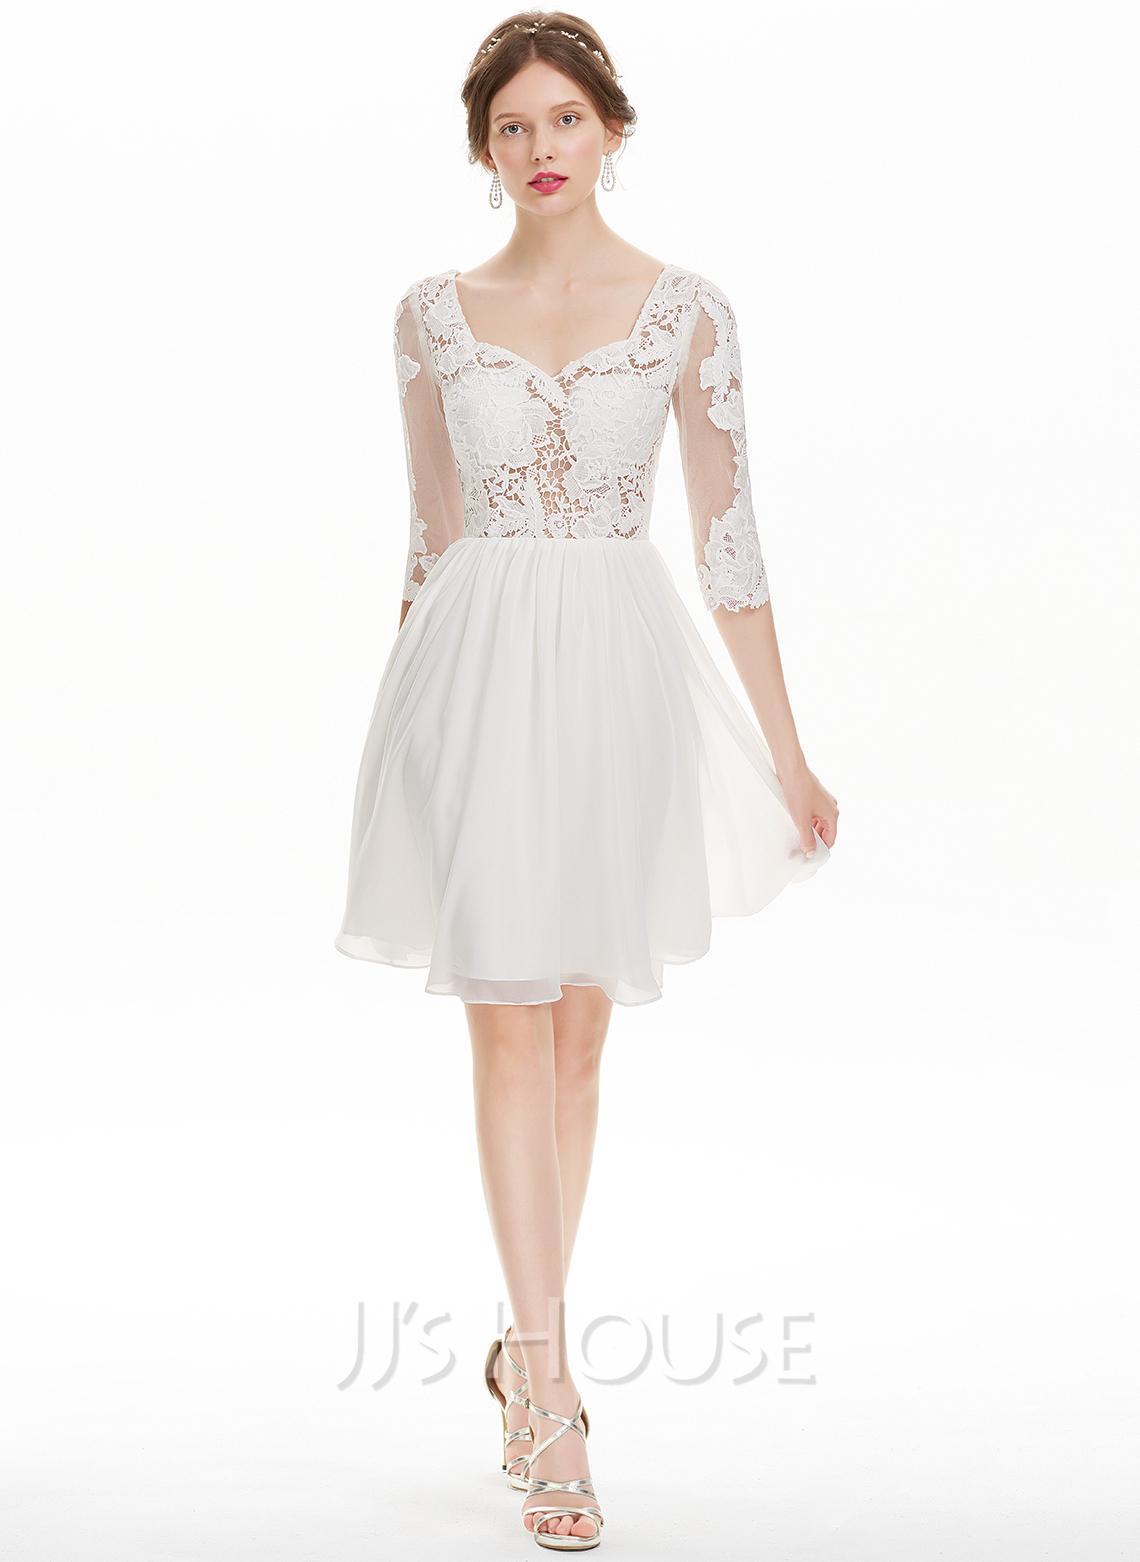 A-Line Sweetheart Knee-Length Chiffon Homecoming Dress